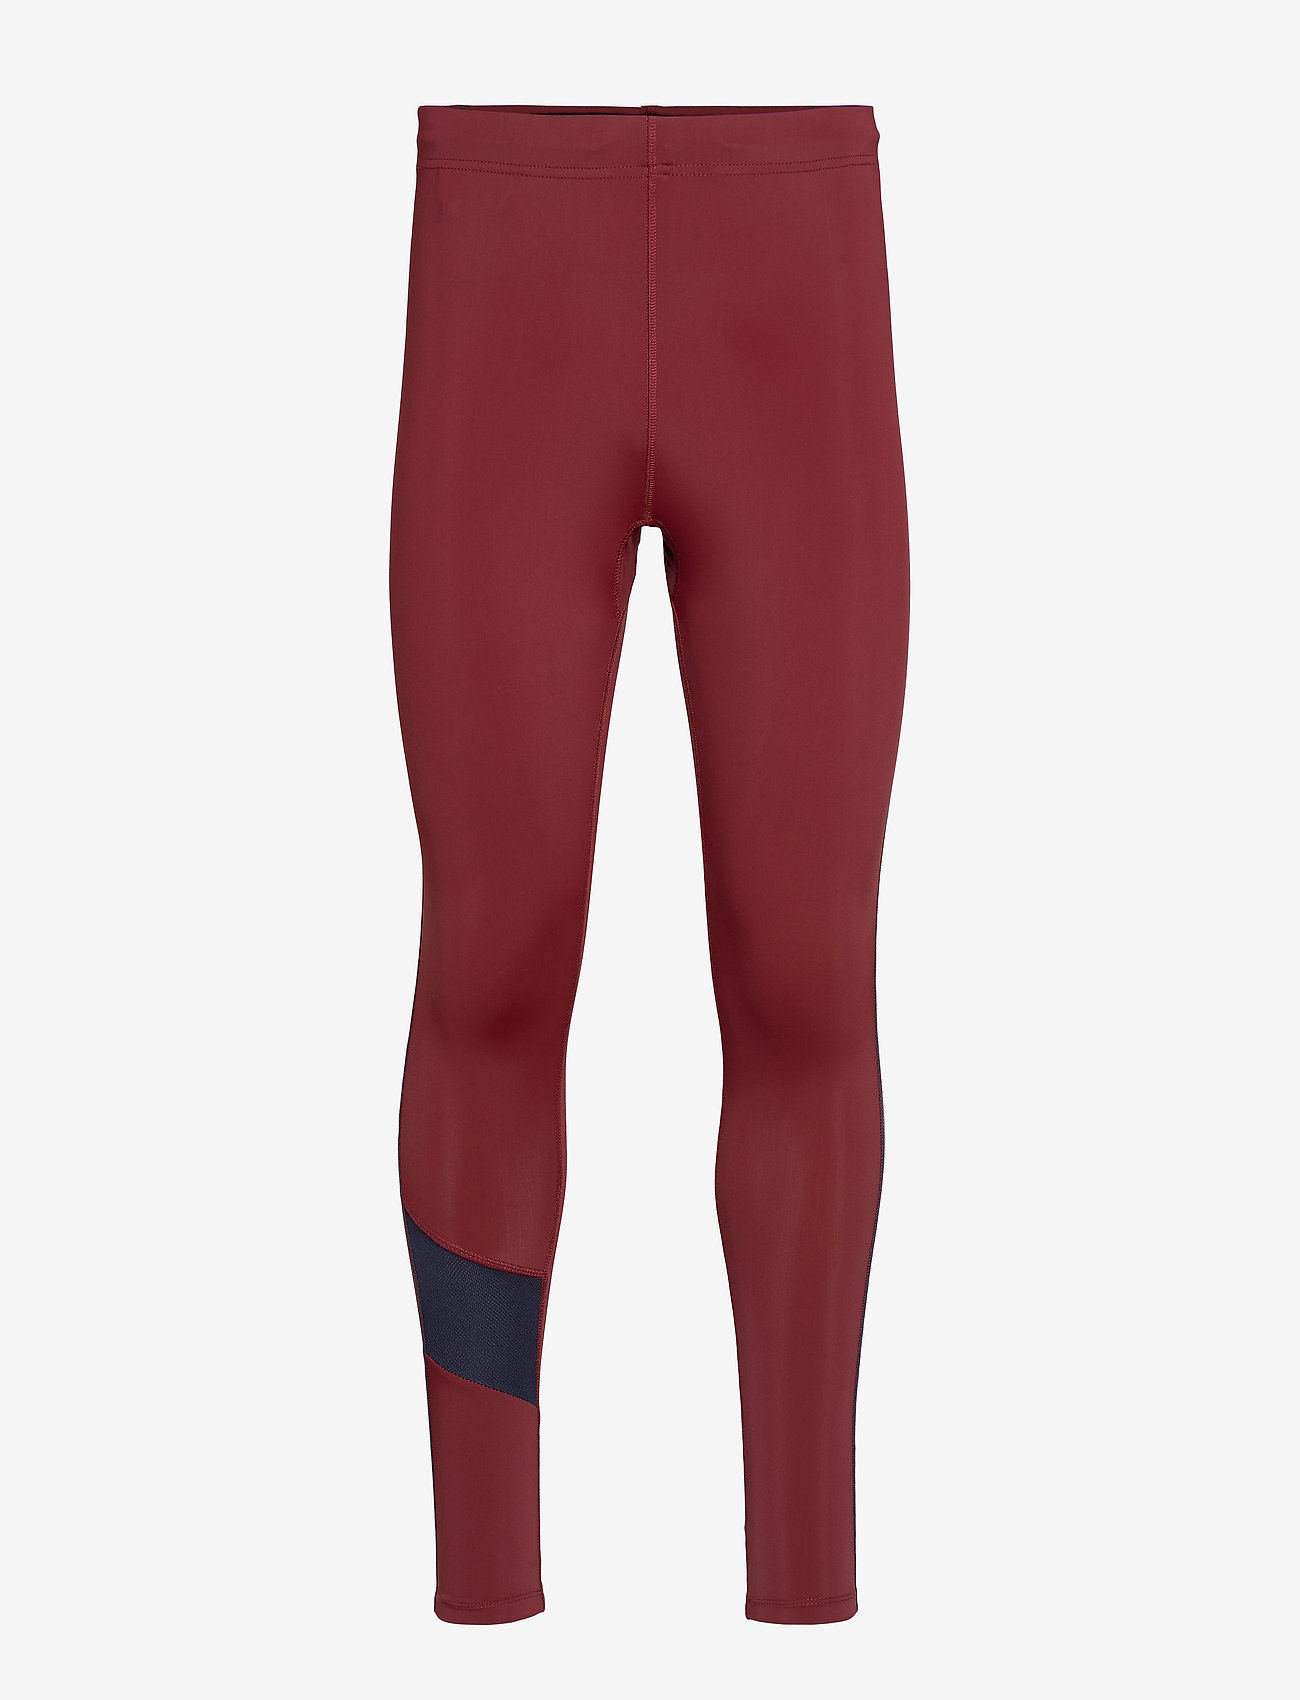 Les Deux - Men's Long Tight Sogndal - running & training tights - clay red - 0